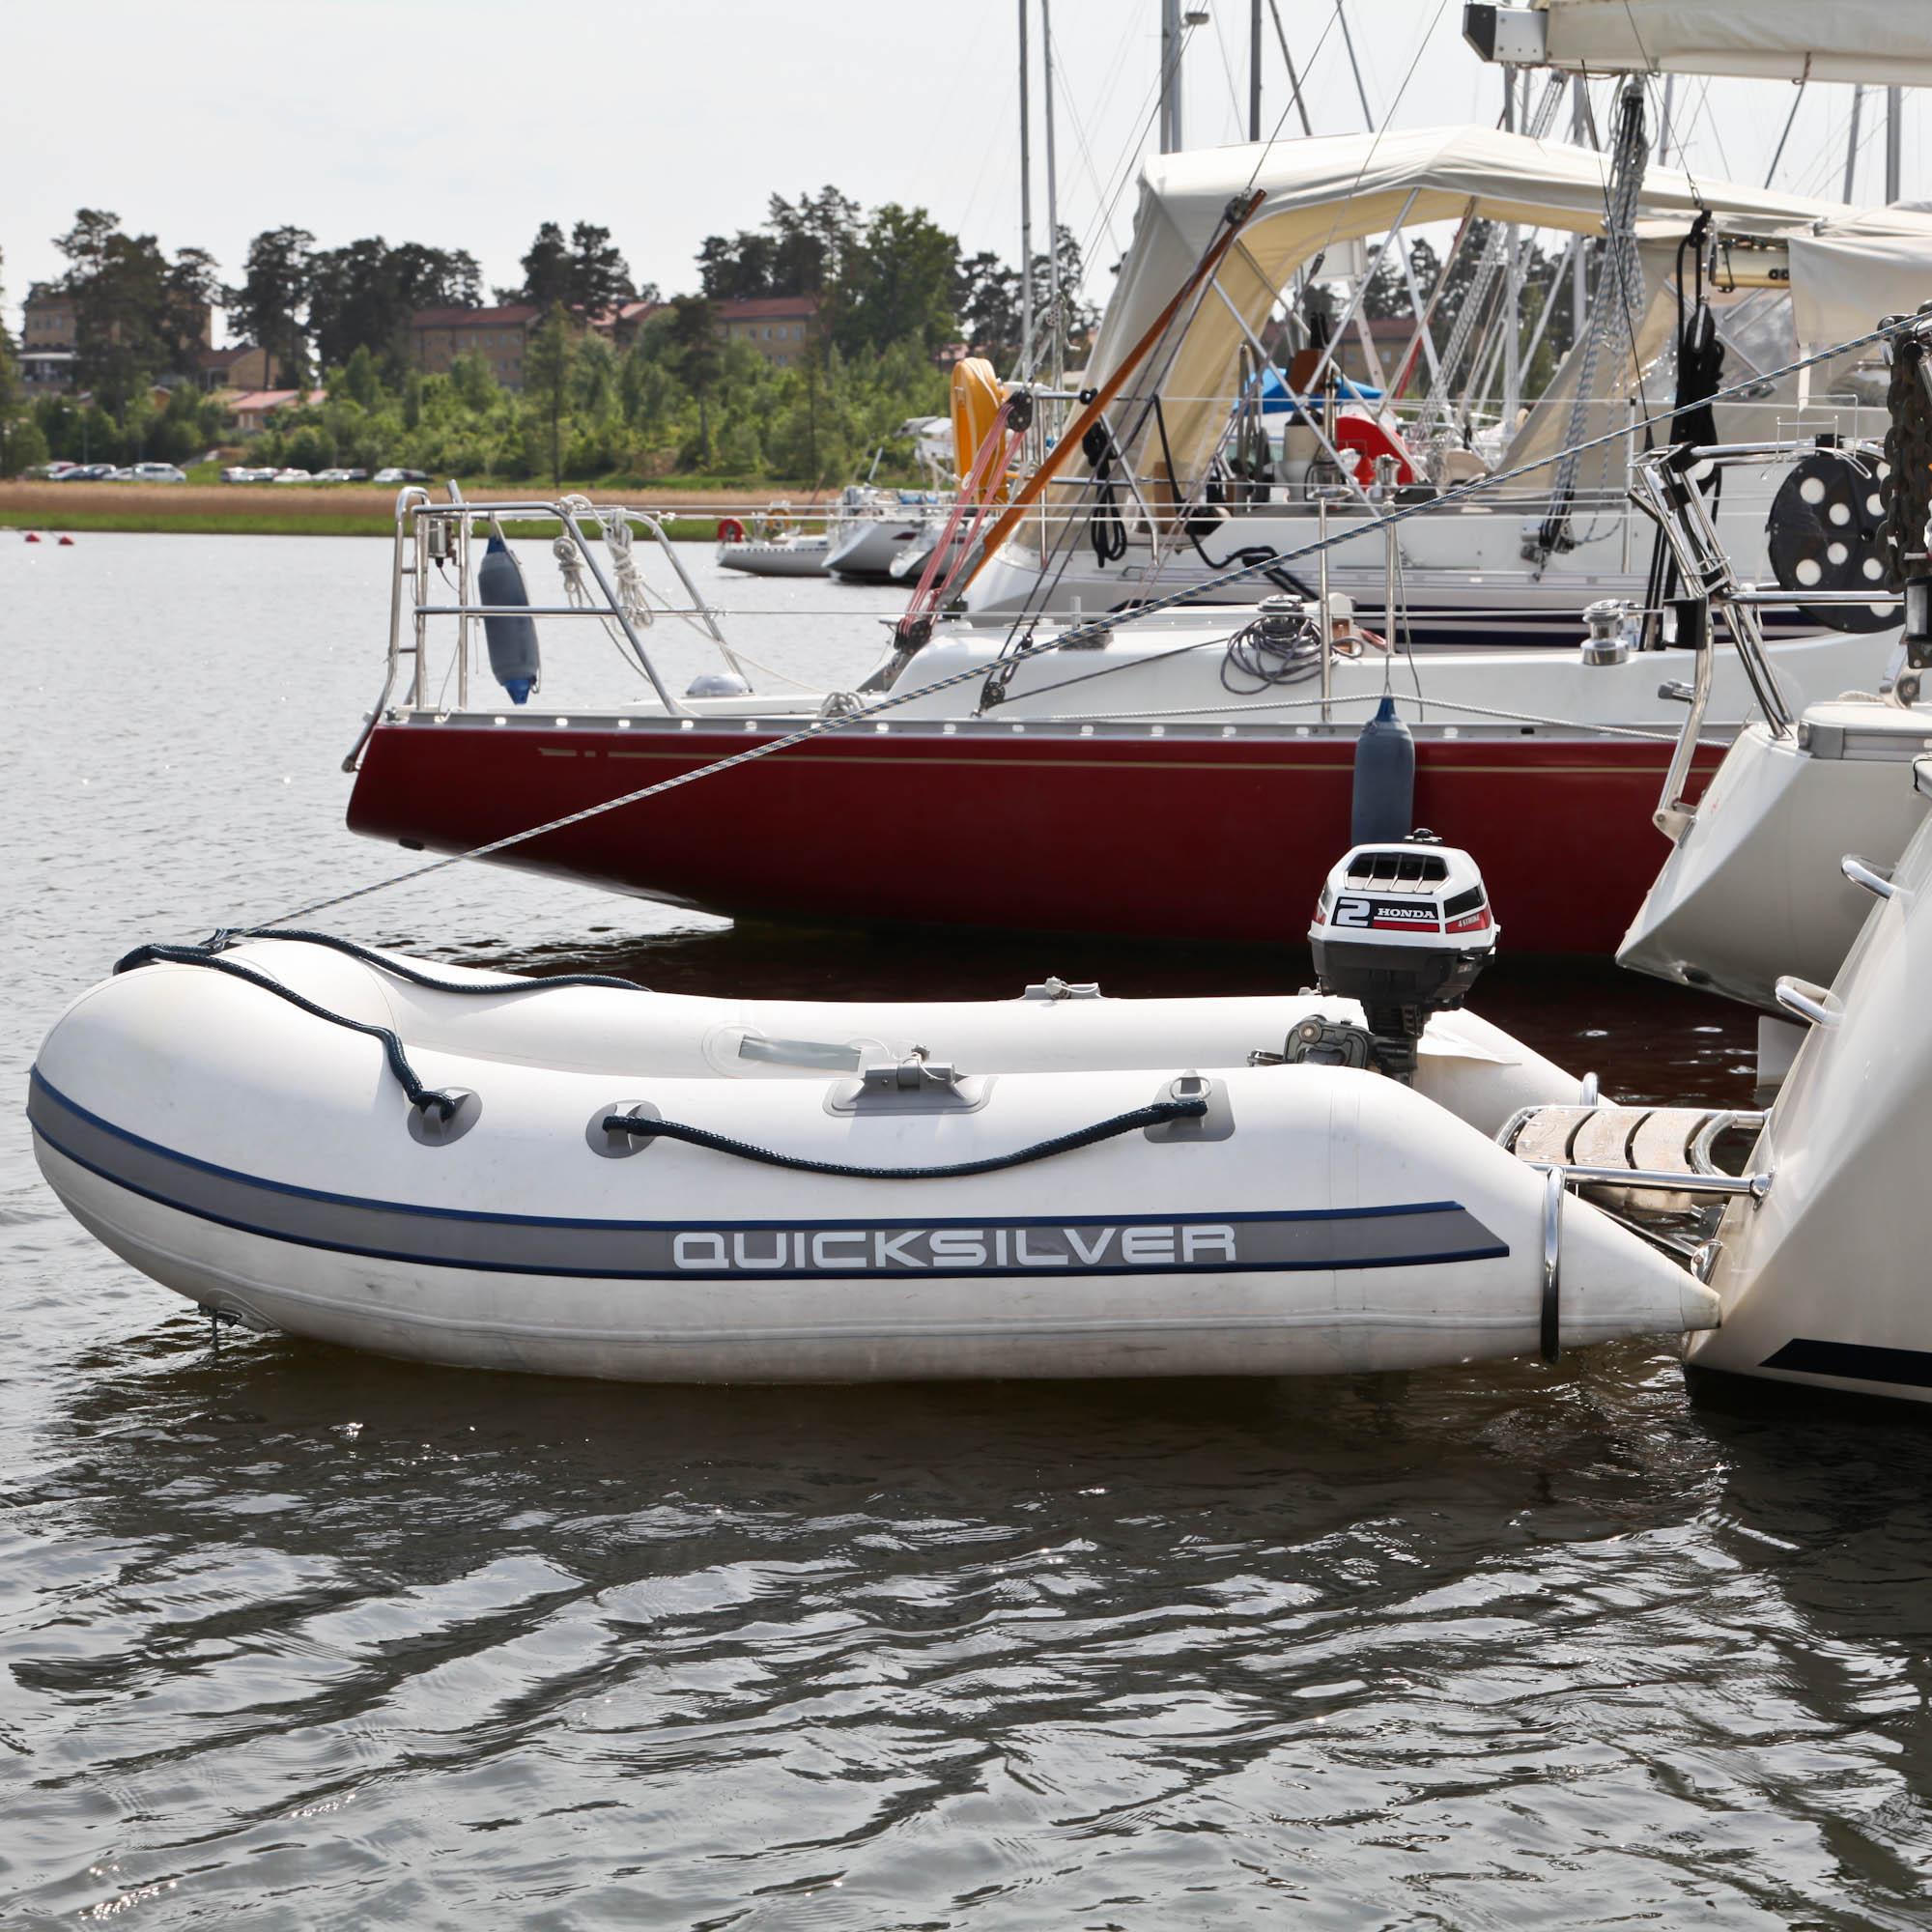 DR segelbåt jolle i vatten